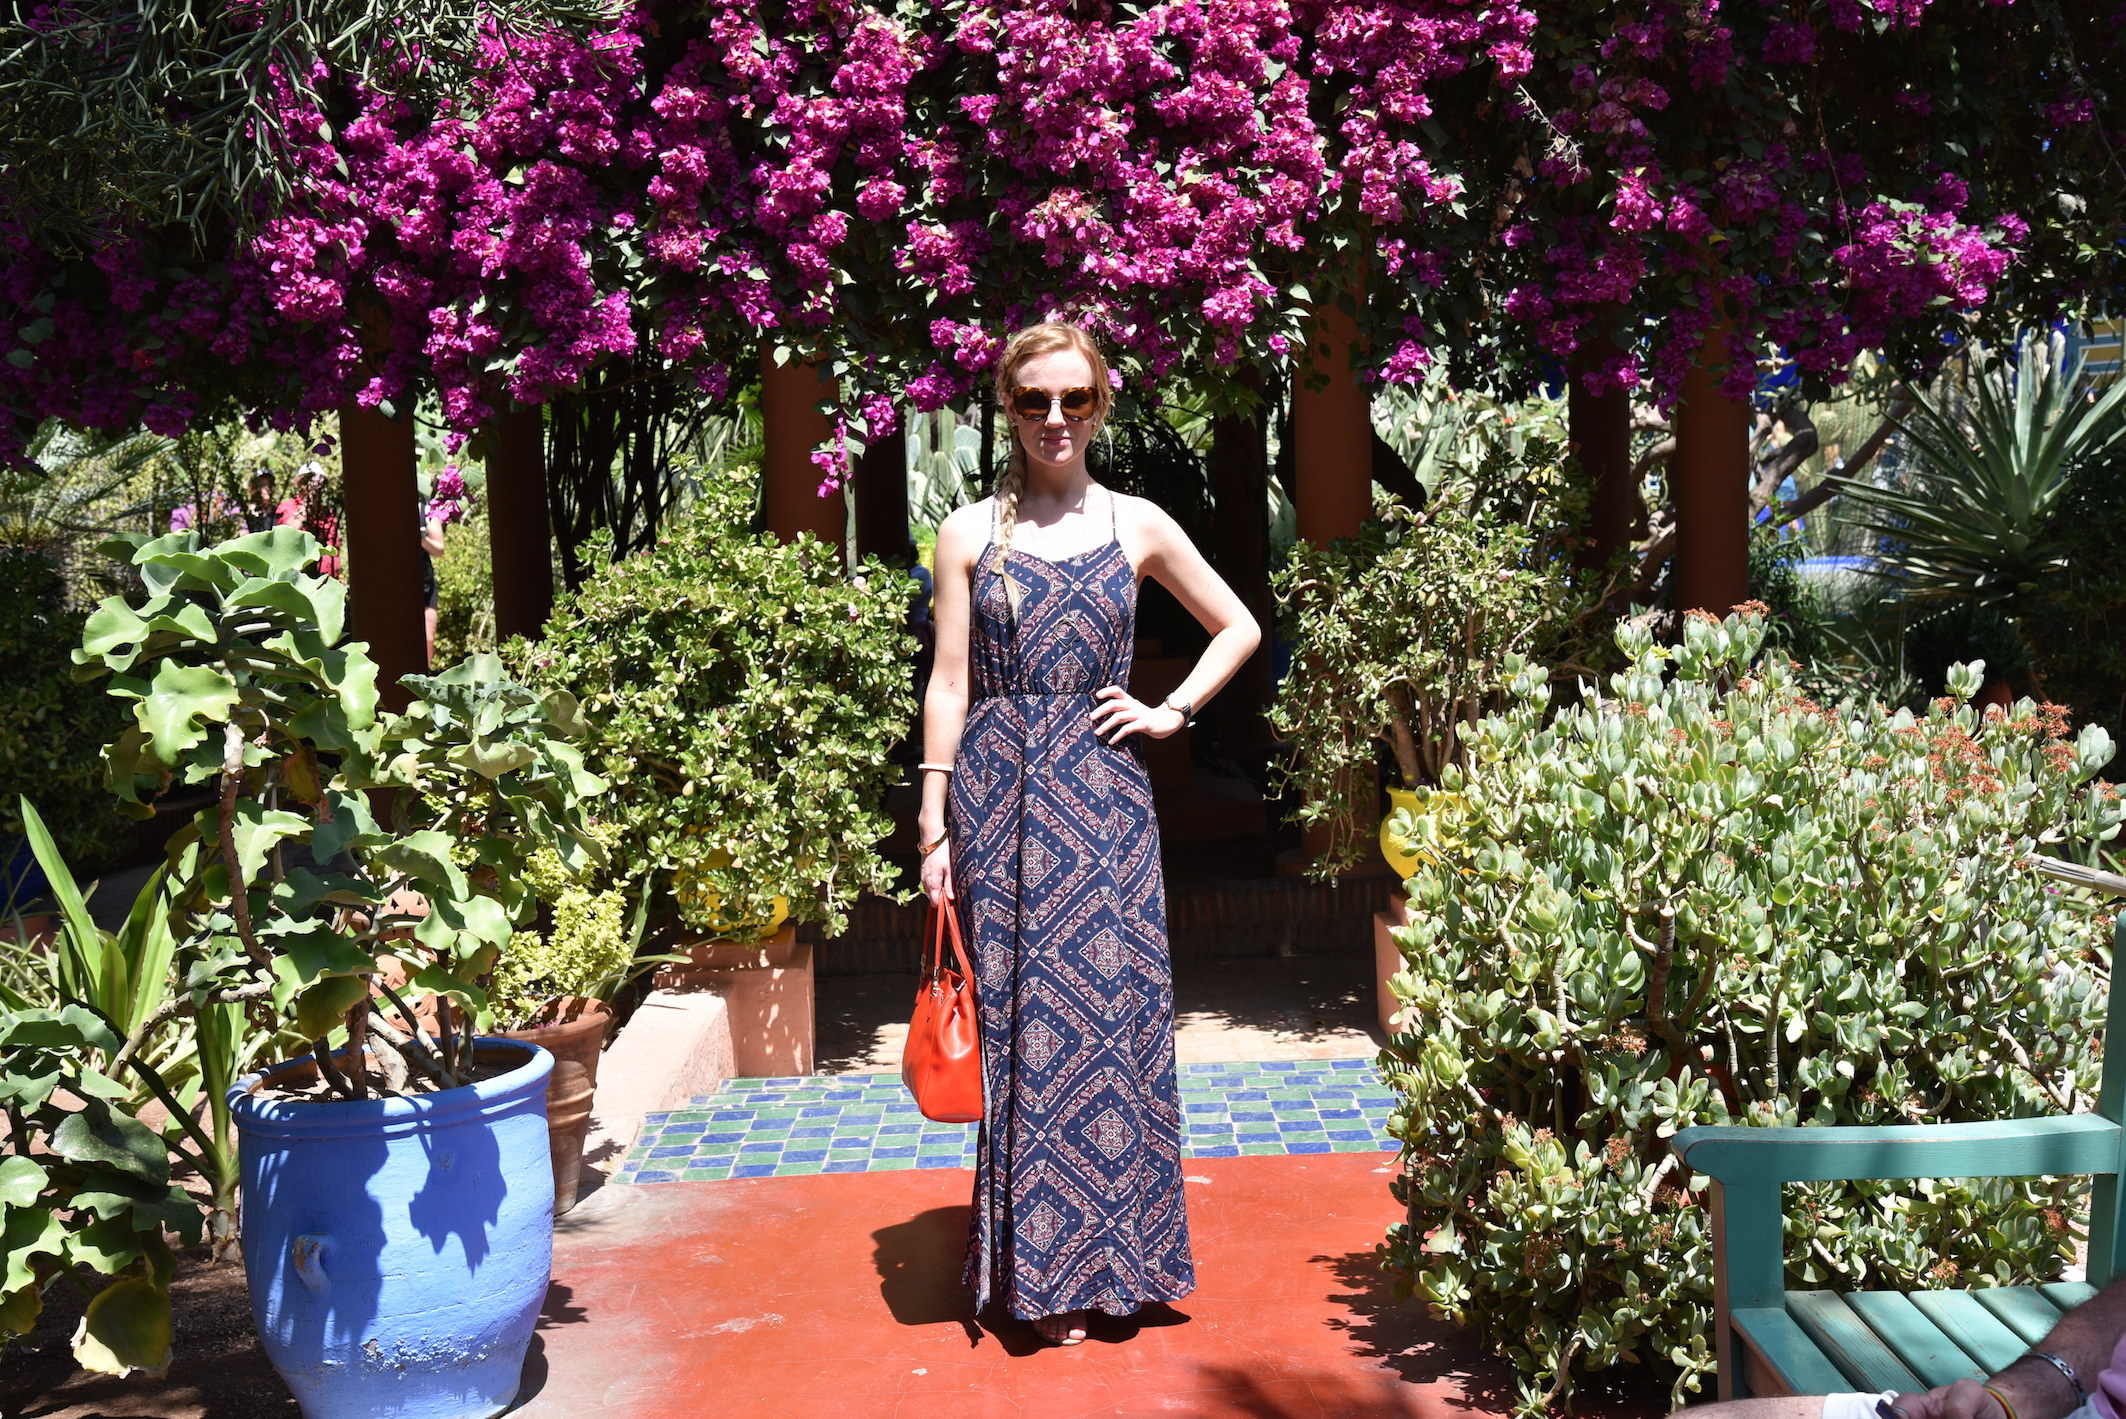 OOTD-Fashion-Blogger-Travel-Style-Marrakech-MyBigAppleCity